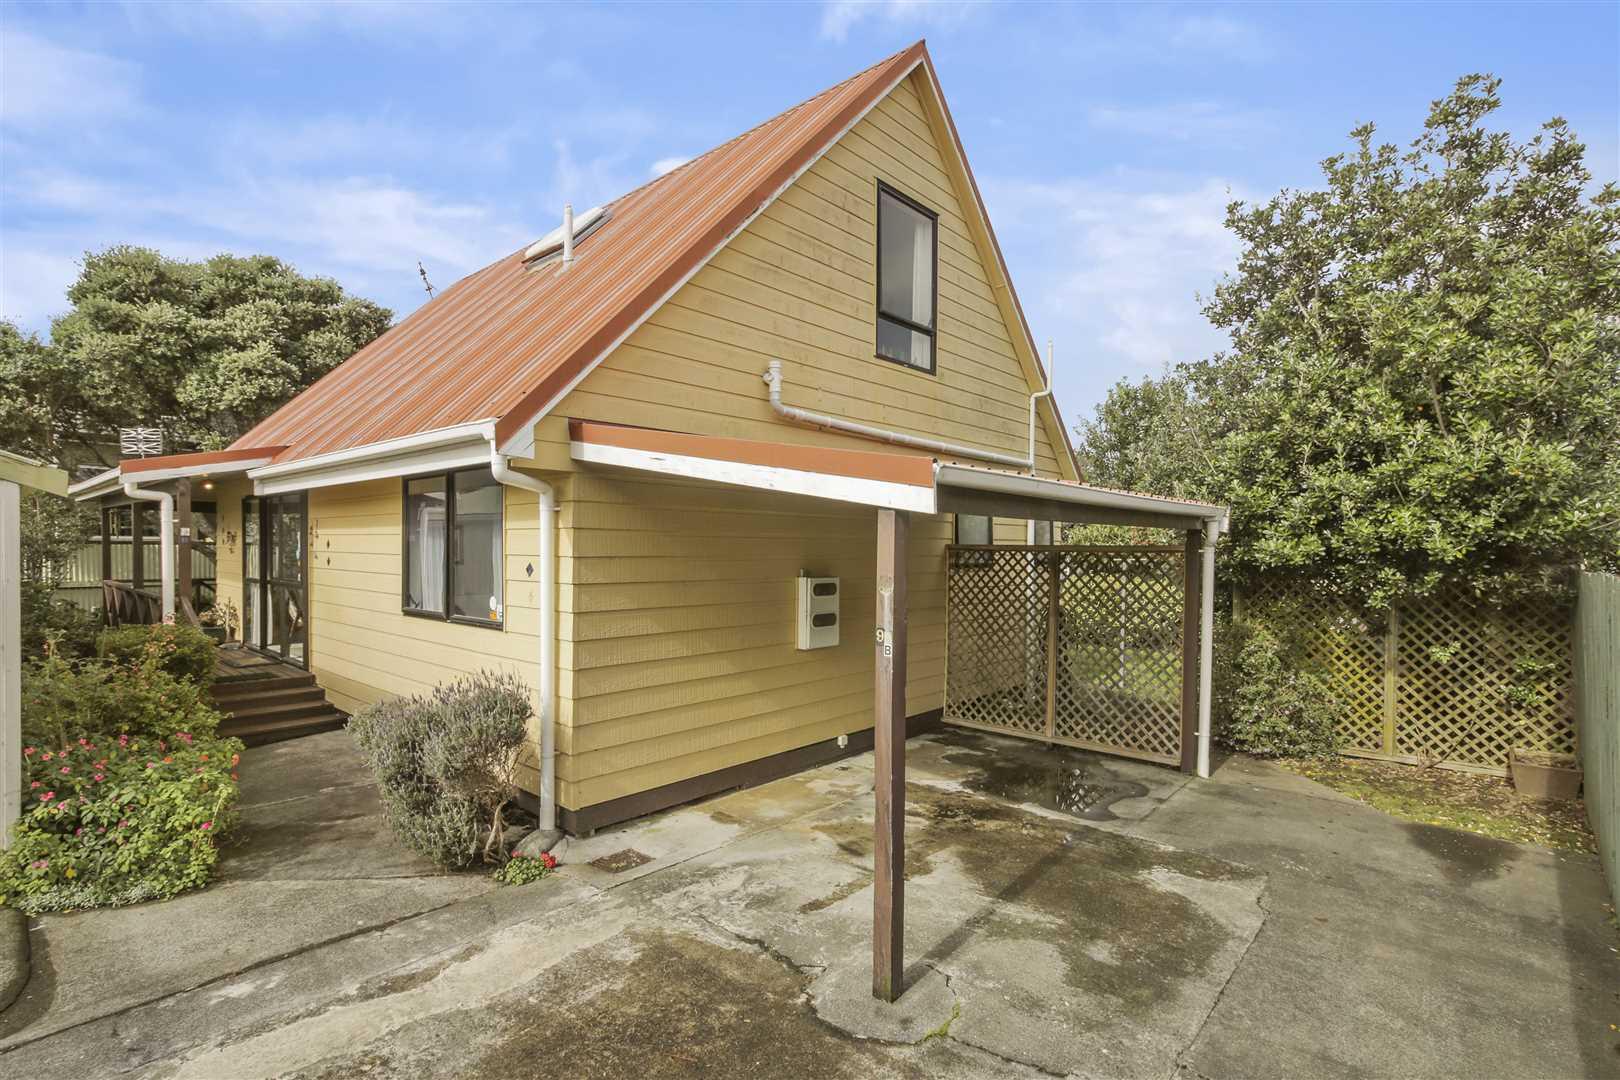 Papatoetoe, 9B Sunnyside Crescent | Harcourts Flat Bush | Harcourts